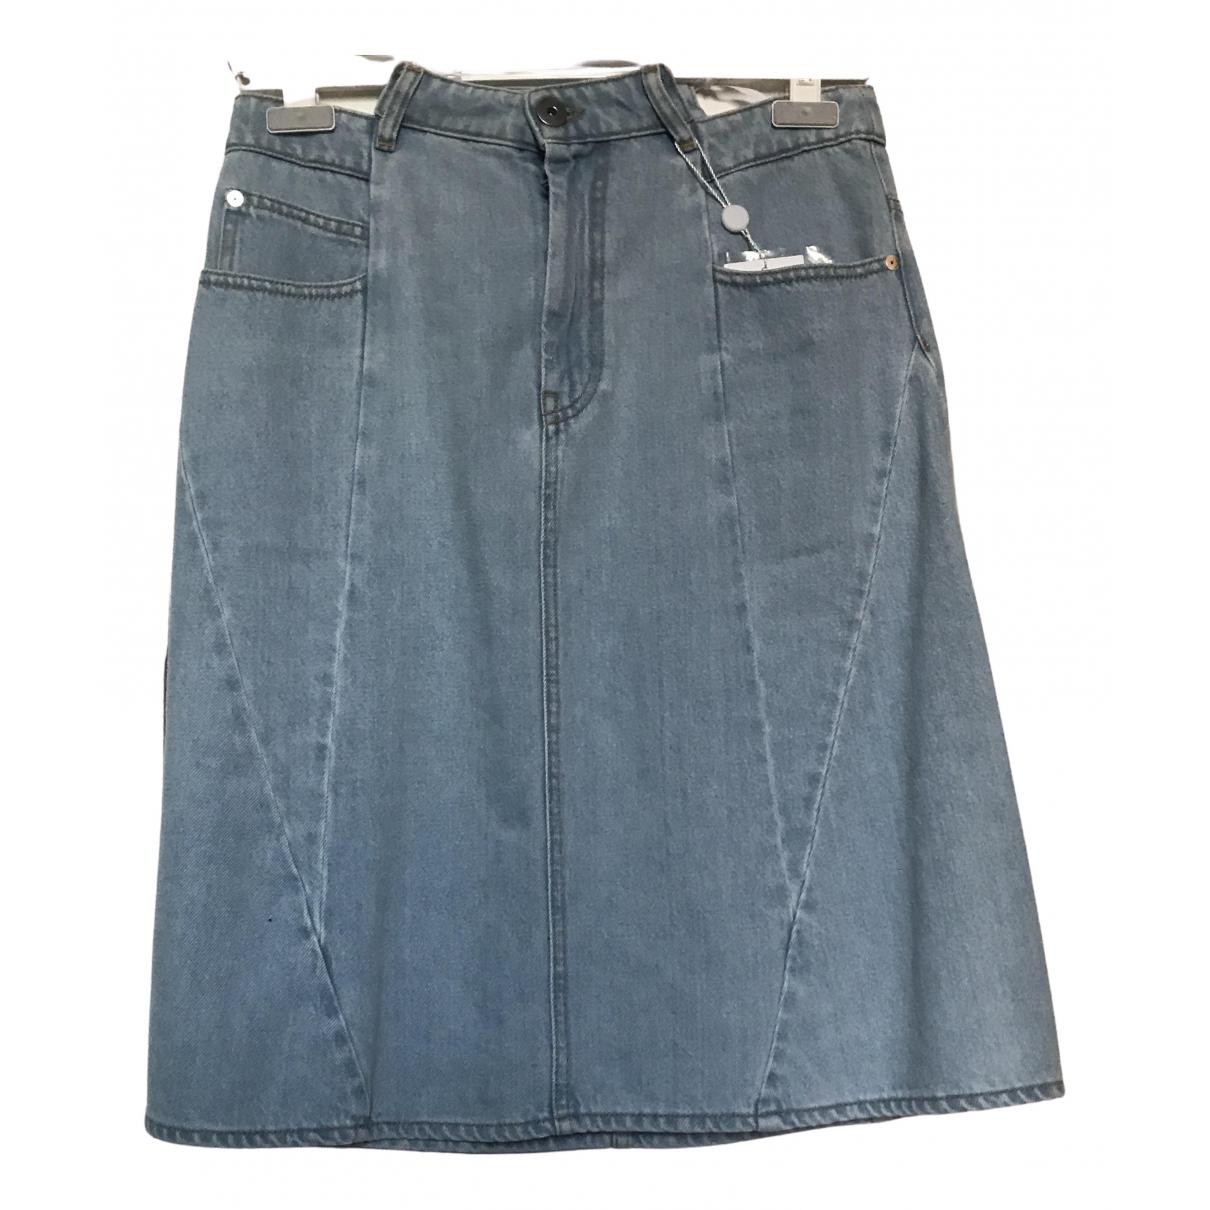 Maison Martin Margiela \N Rocke in  Blau Denim - Jeans